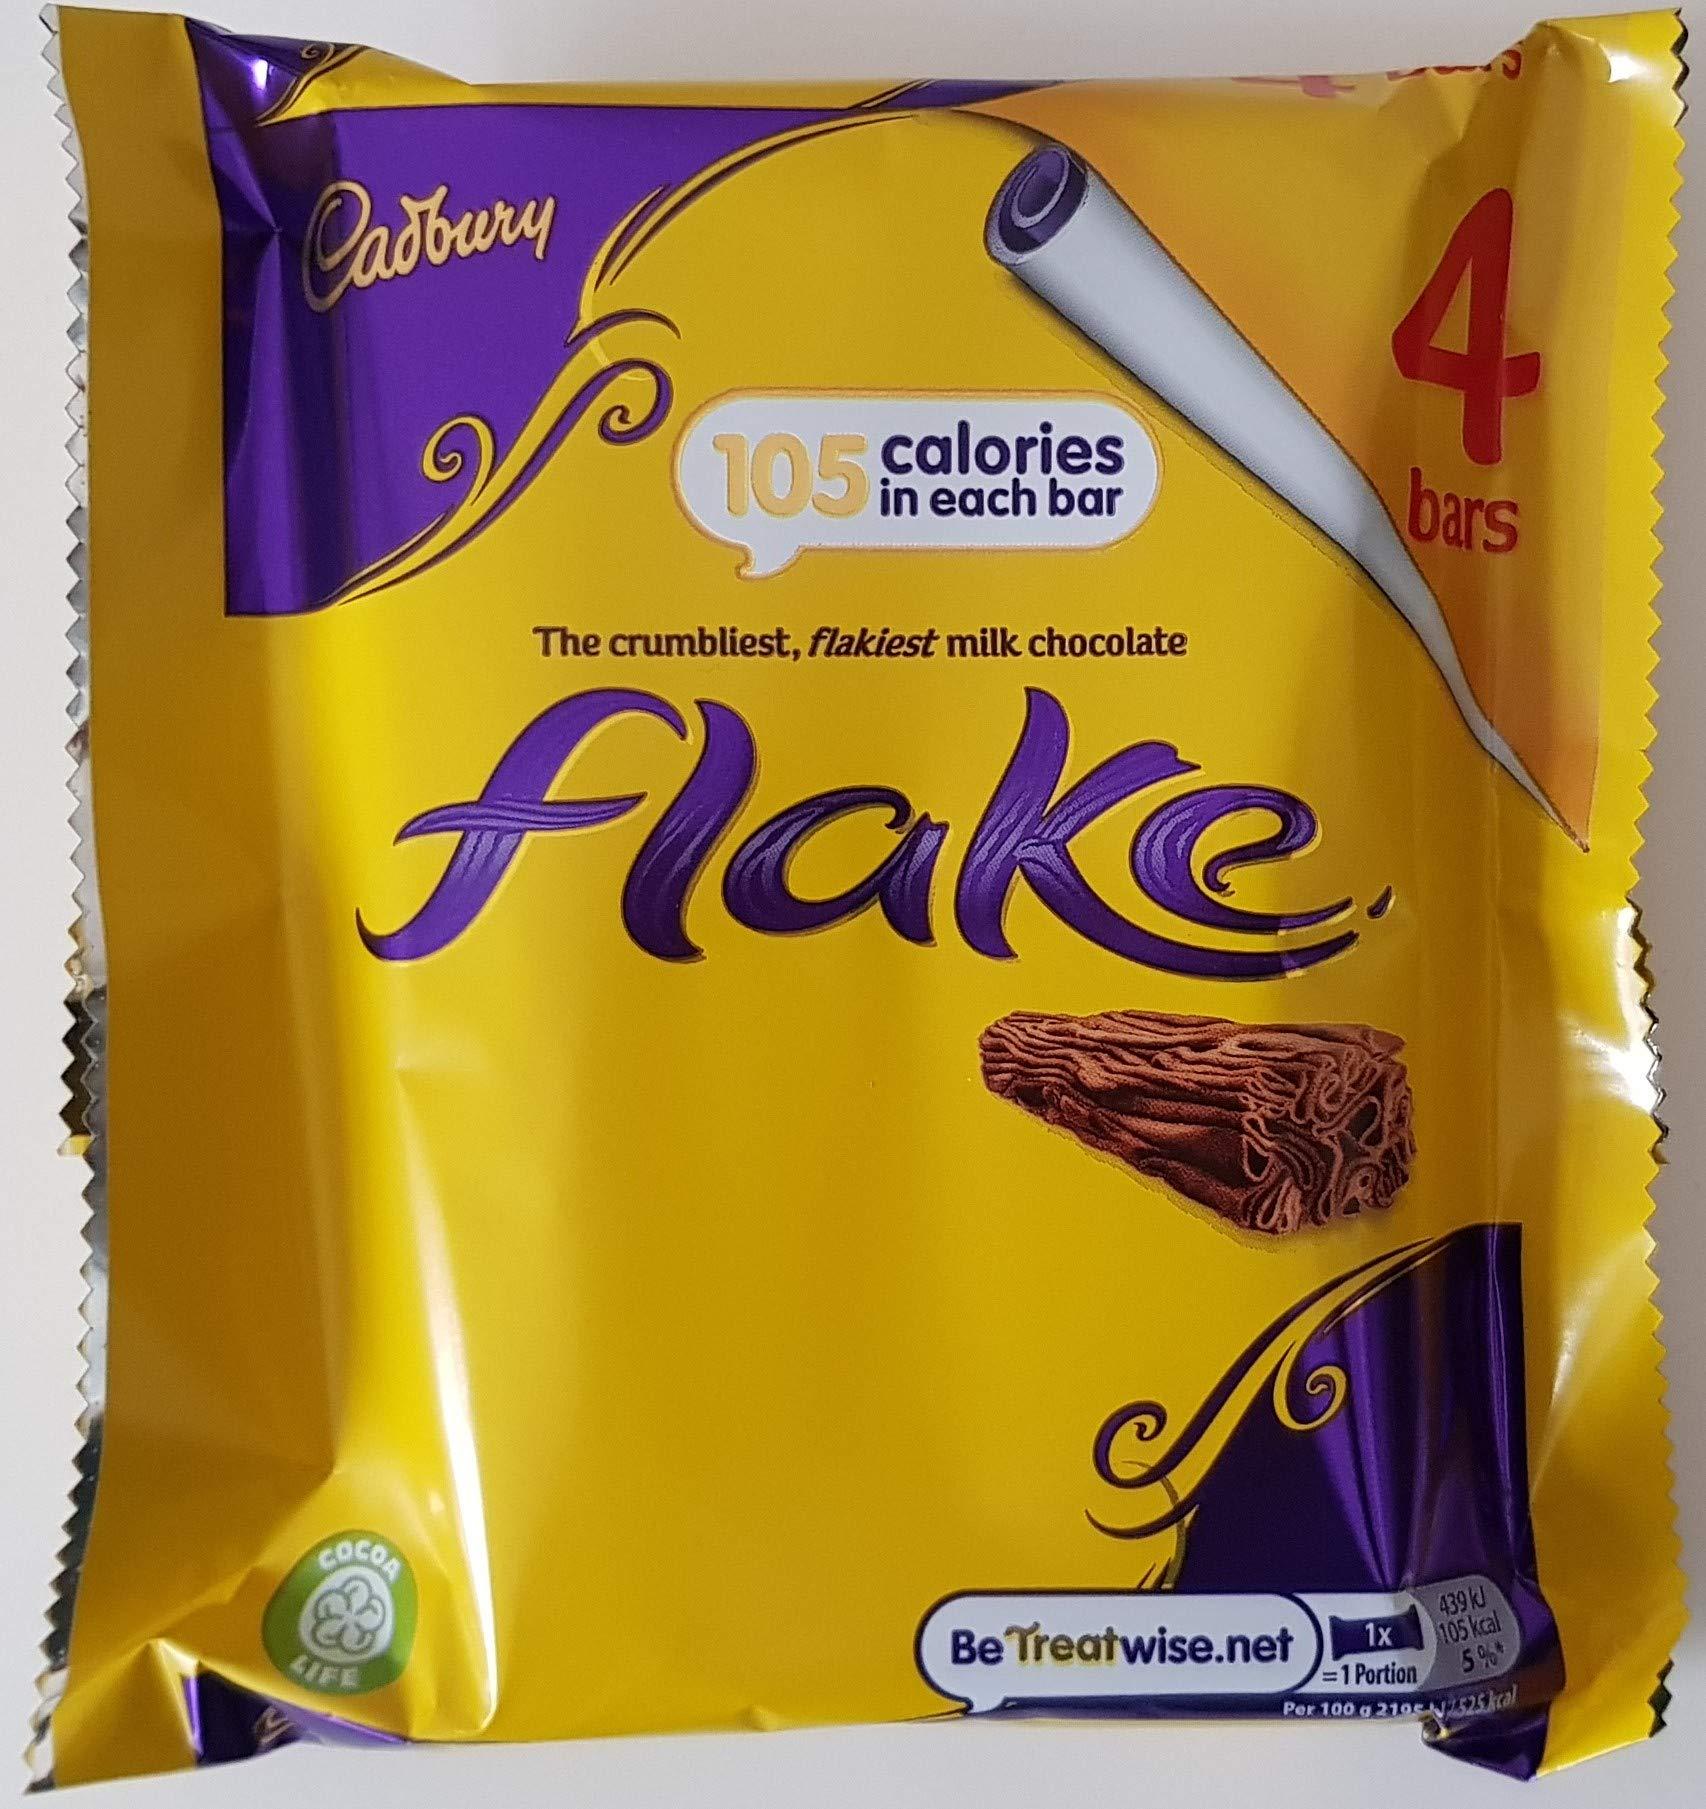 Original Cadbury Flake Chocolate Bar Imported from the UK England Original British Flake